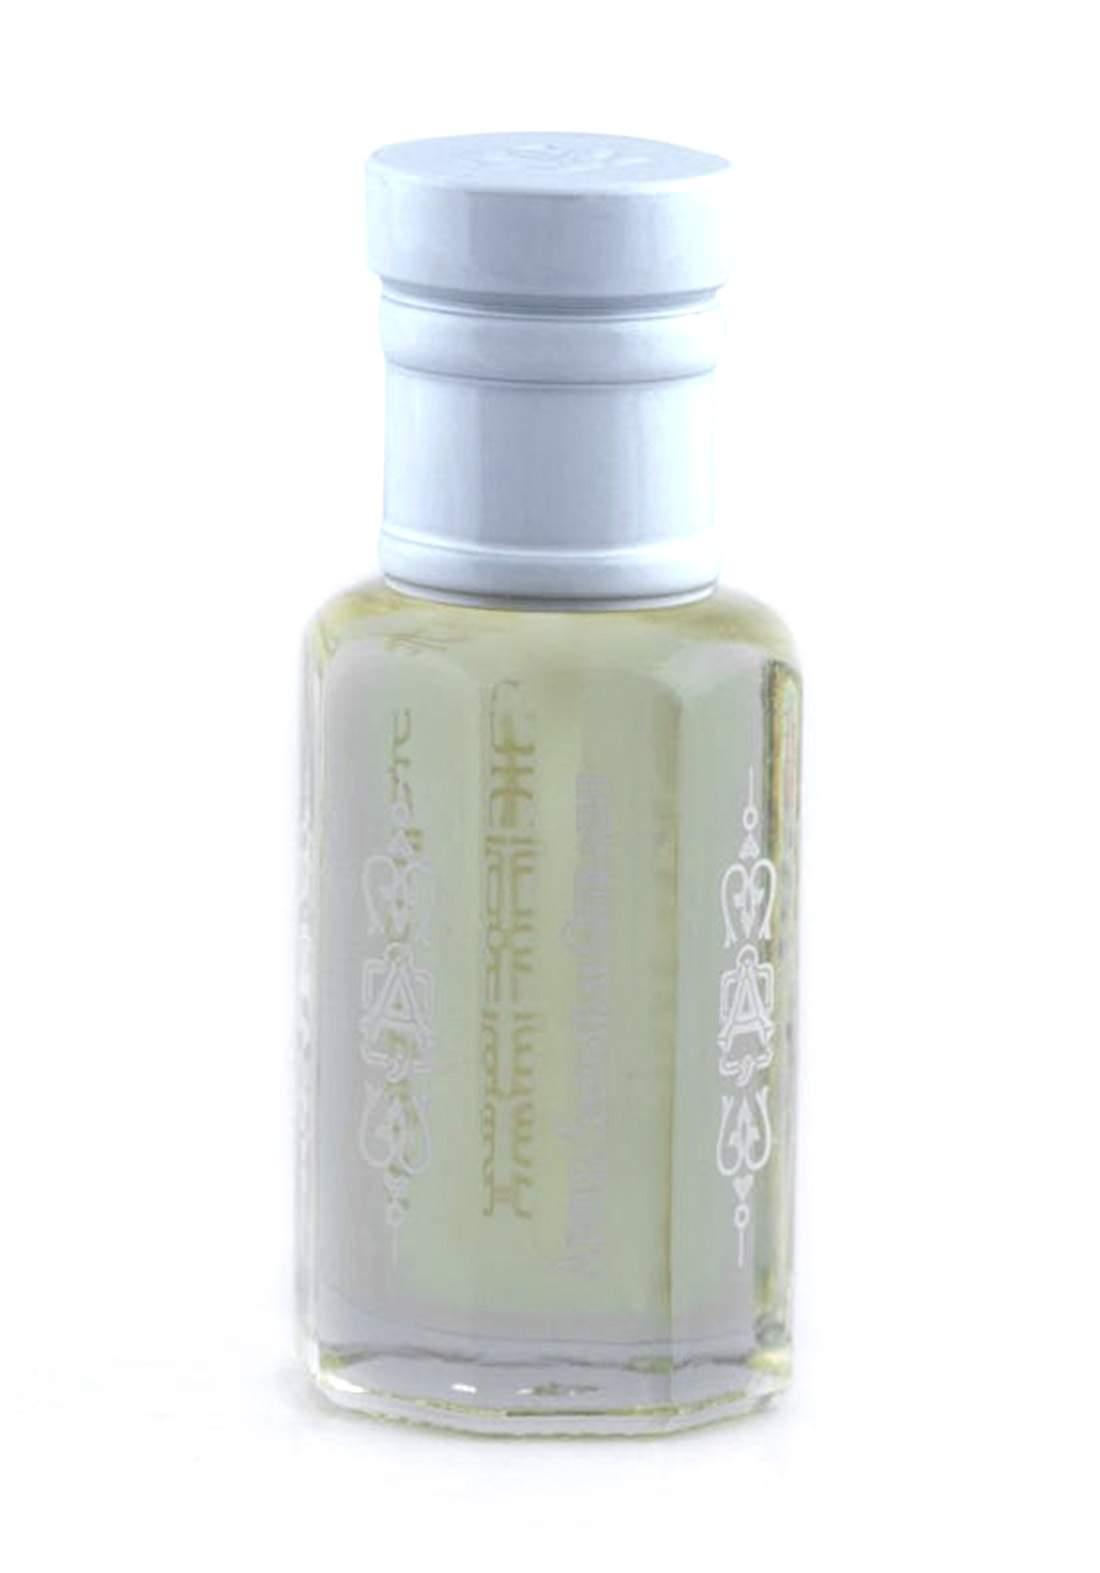 Abdul Samad Al Qurashi 14002 Sandal Spirit Perfume Oil عطر زيتي رجالي ونسائي